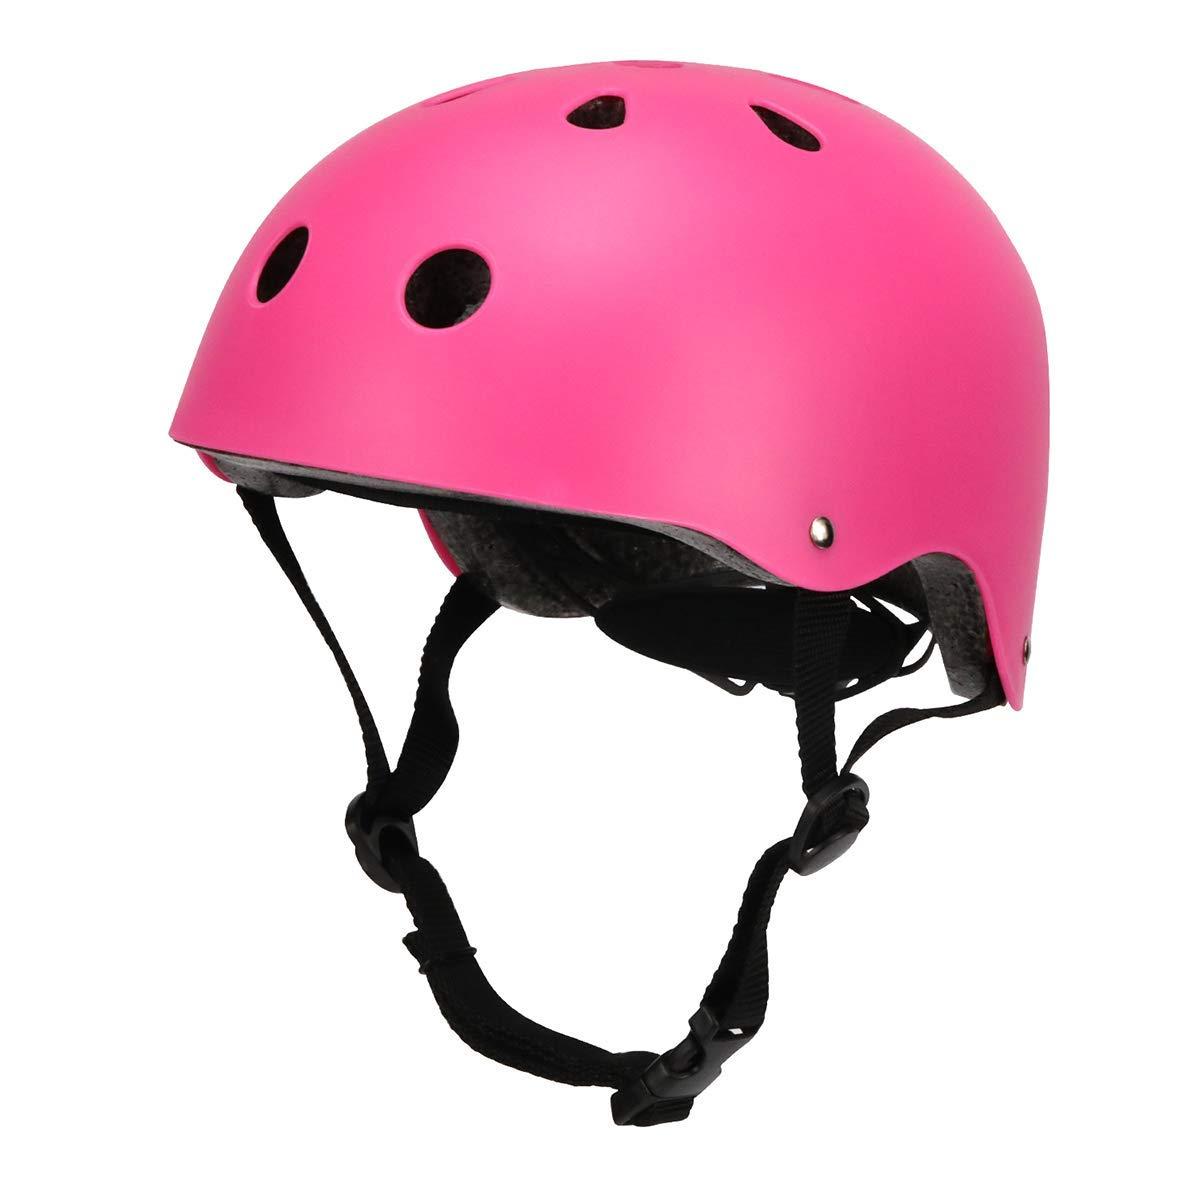 Kids Bike Helmet,Toddler Skateboard Helmet Adjustable Impact Resistance Ventilation Multi-Sport Helmet,Youth Sports Safety Protective Helme for BMX Bicycle Skate Scooter Bike Rollerblade Longboard